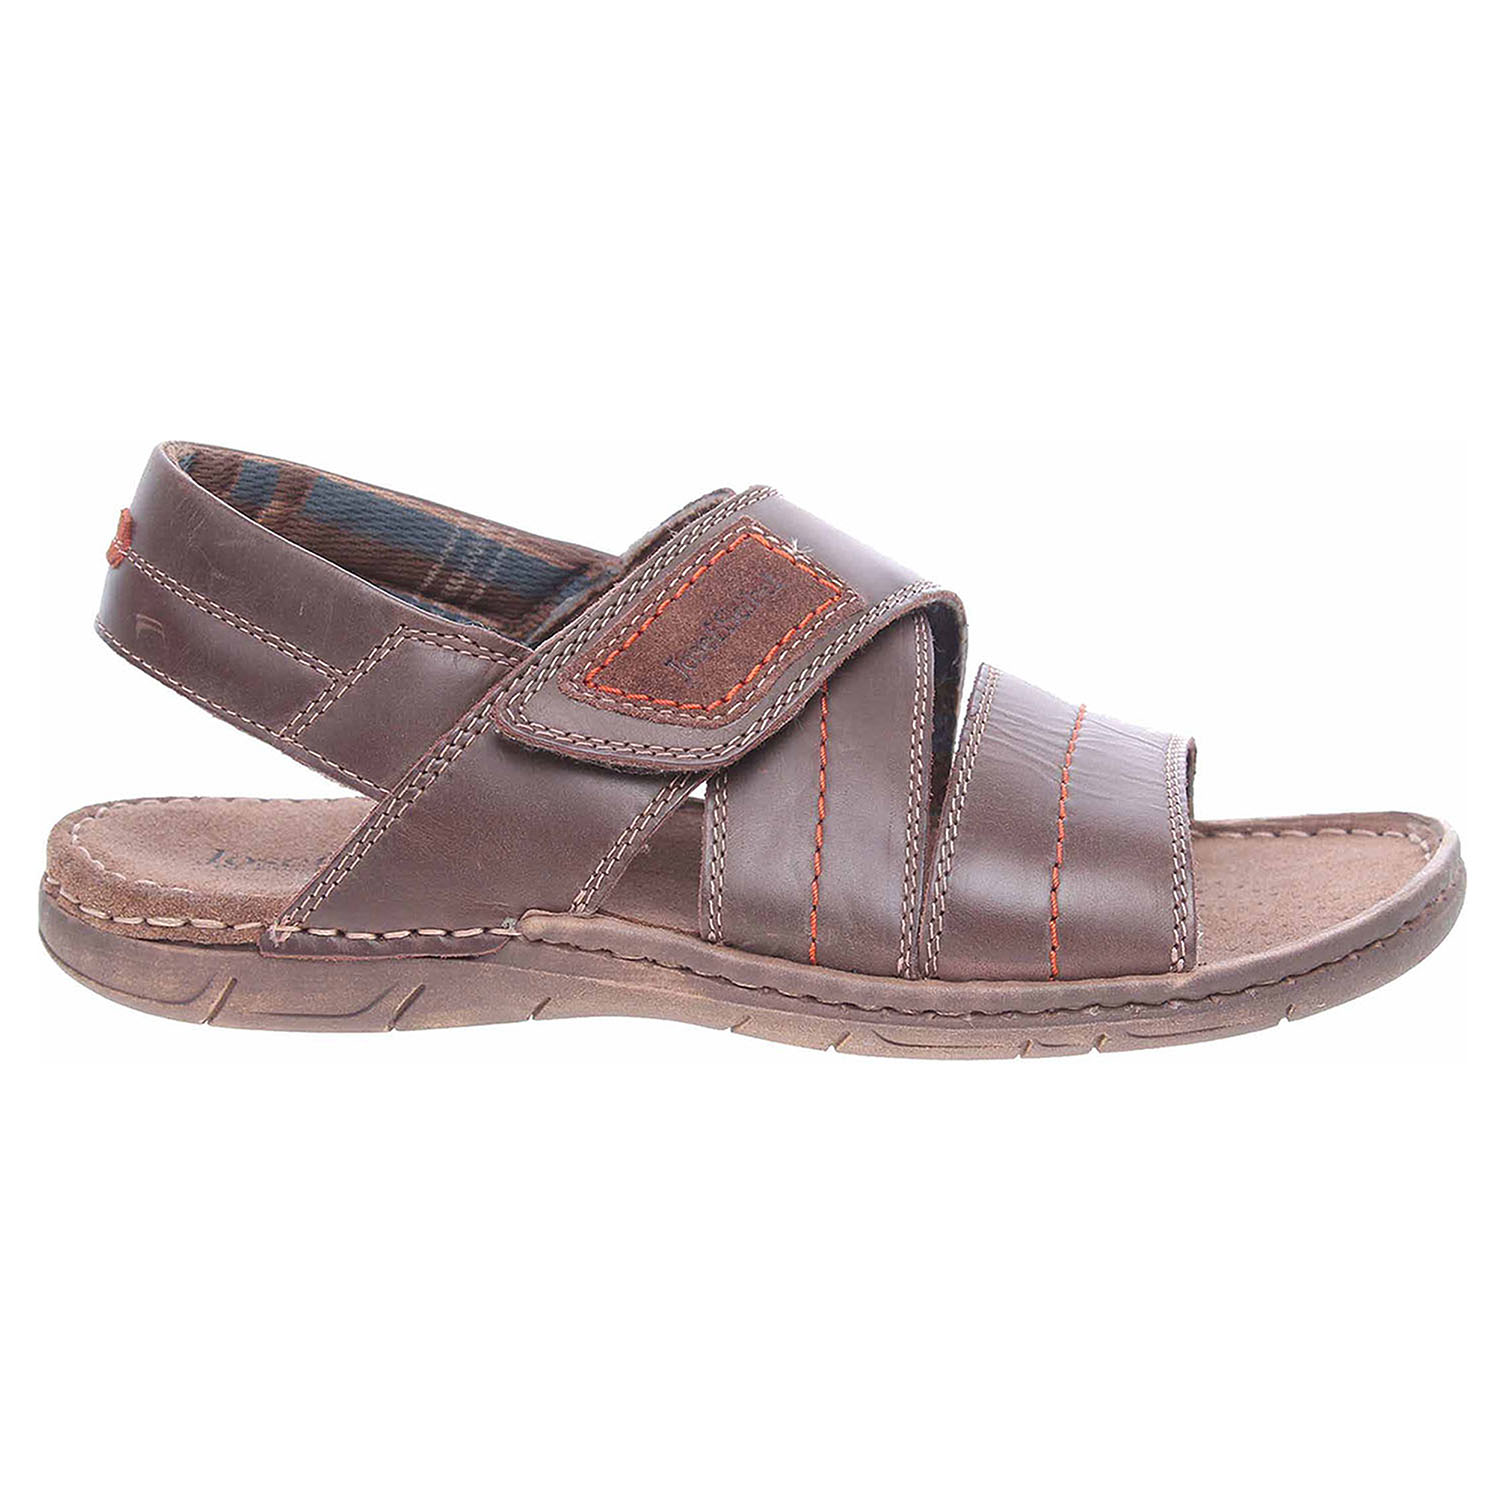 Ecco Josef Seibel pánské sandály 43249 TE787330 moro 24700263 ce11c7f7f8